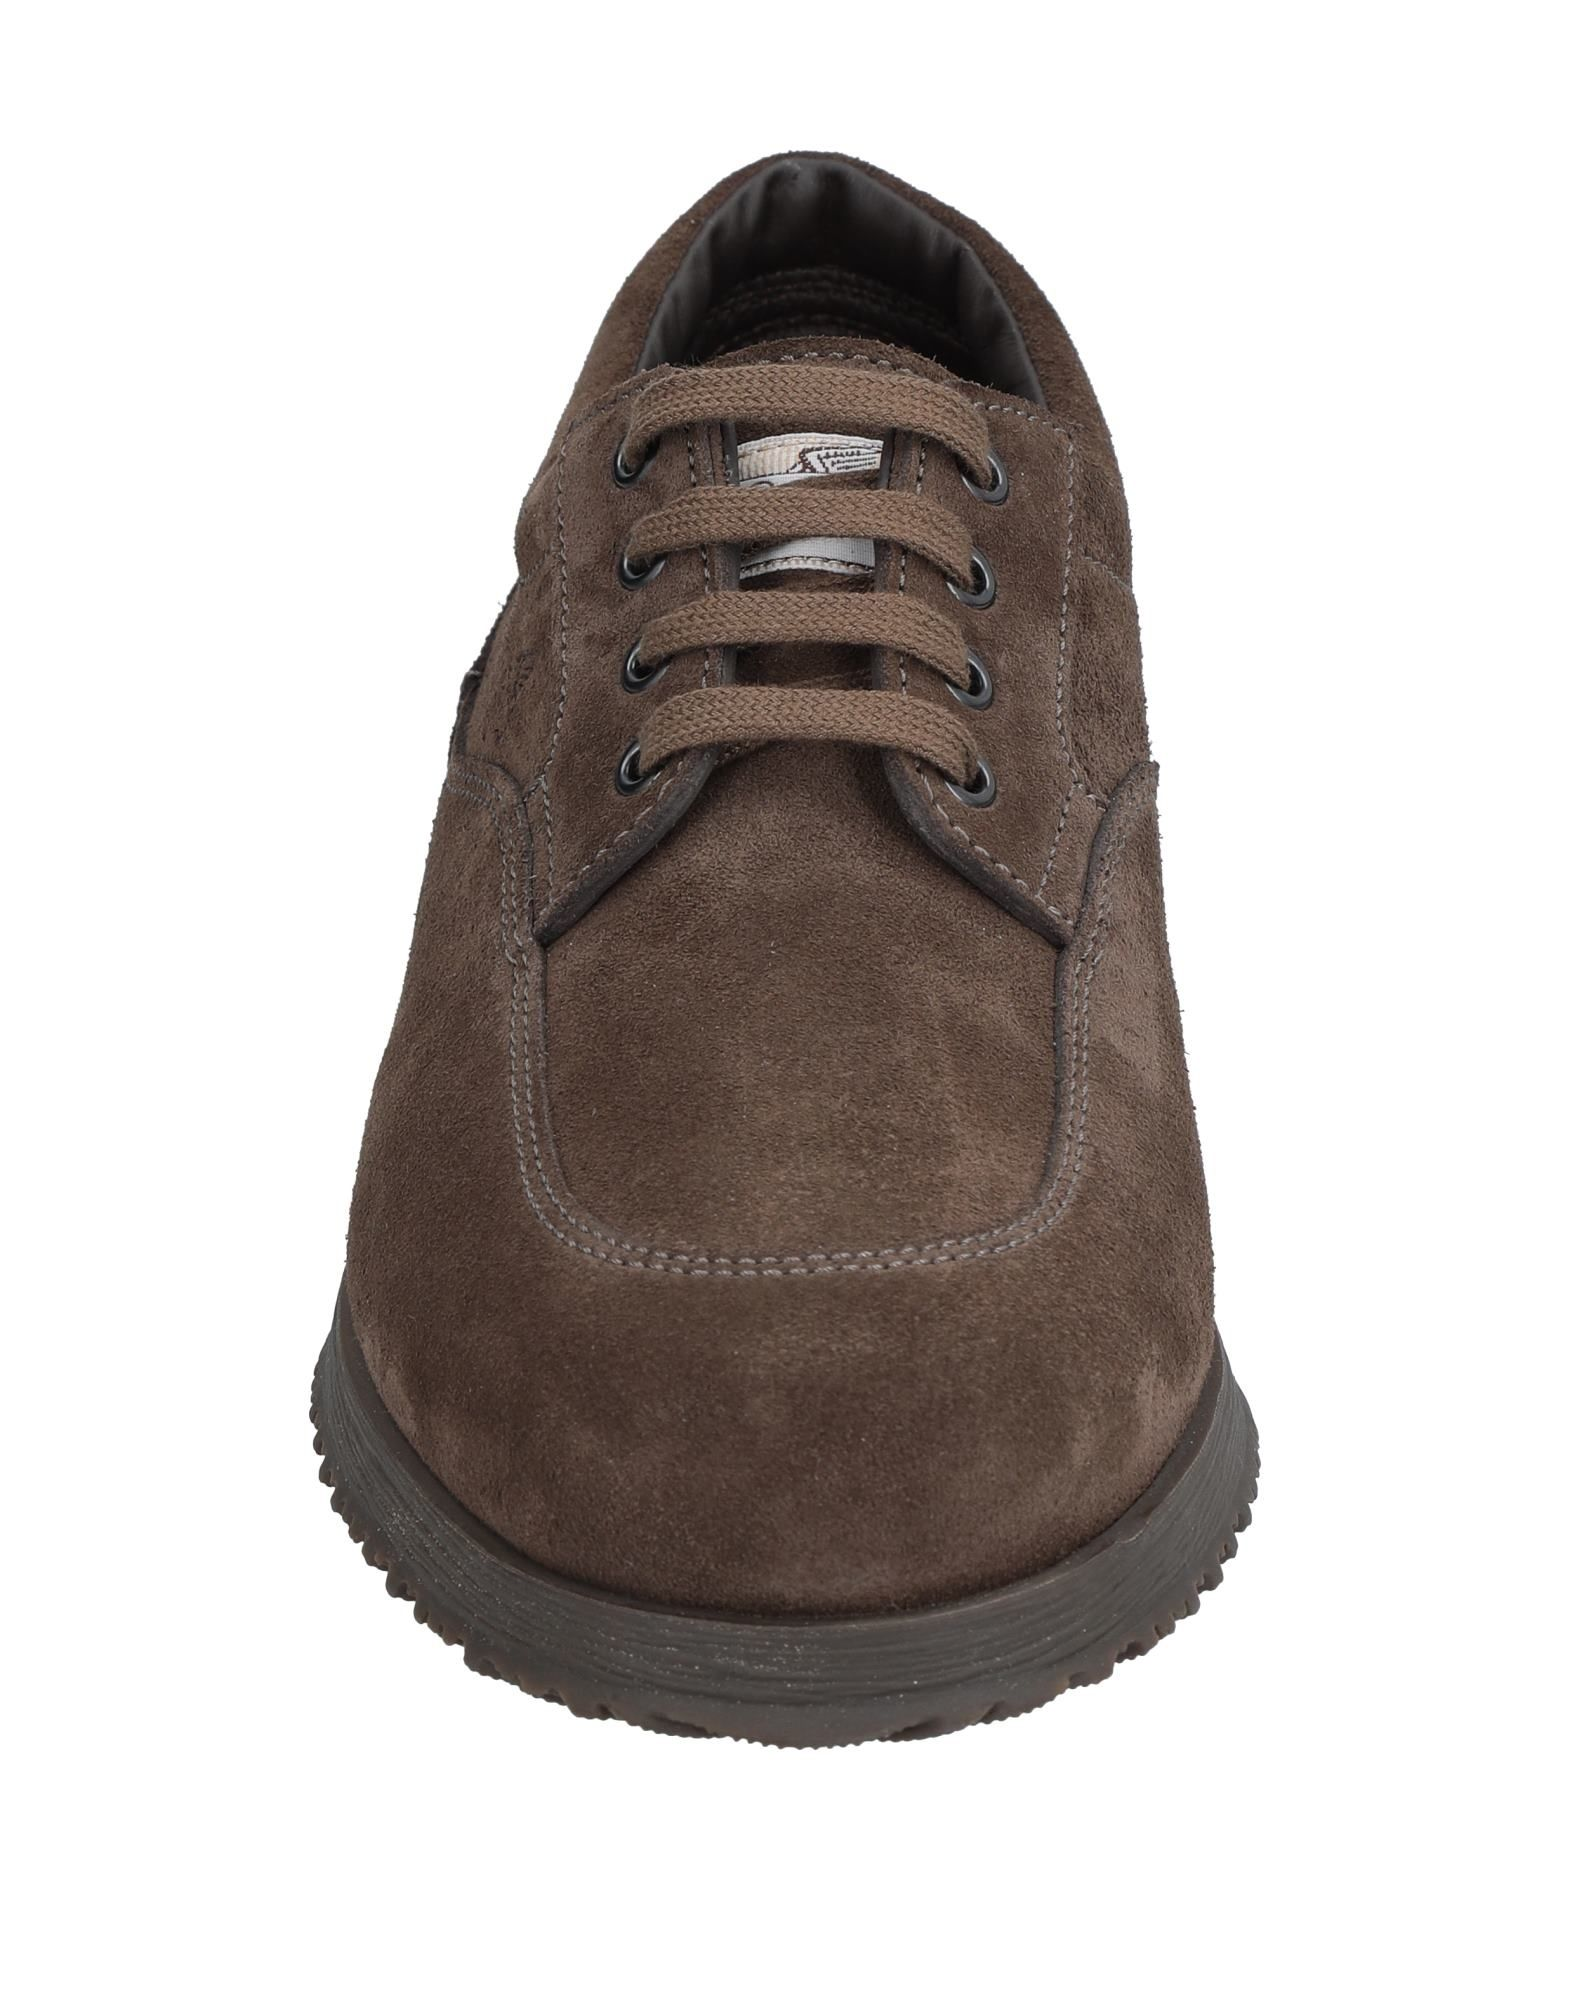 Hogan  Sneakers Herren  Hogan 11540238PF Heiße Schuhe 2794d9